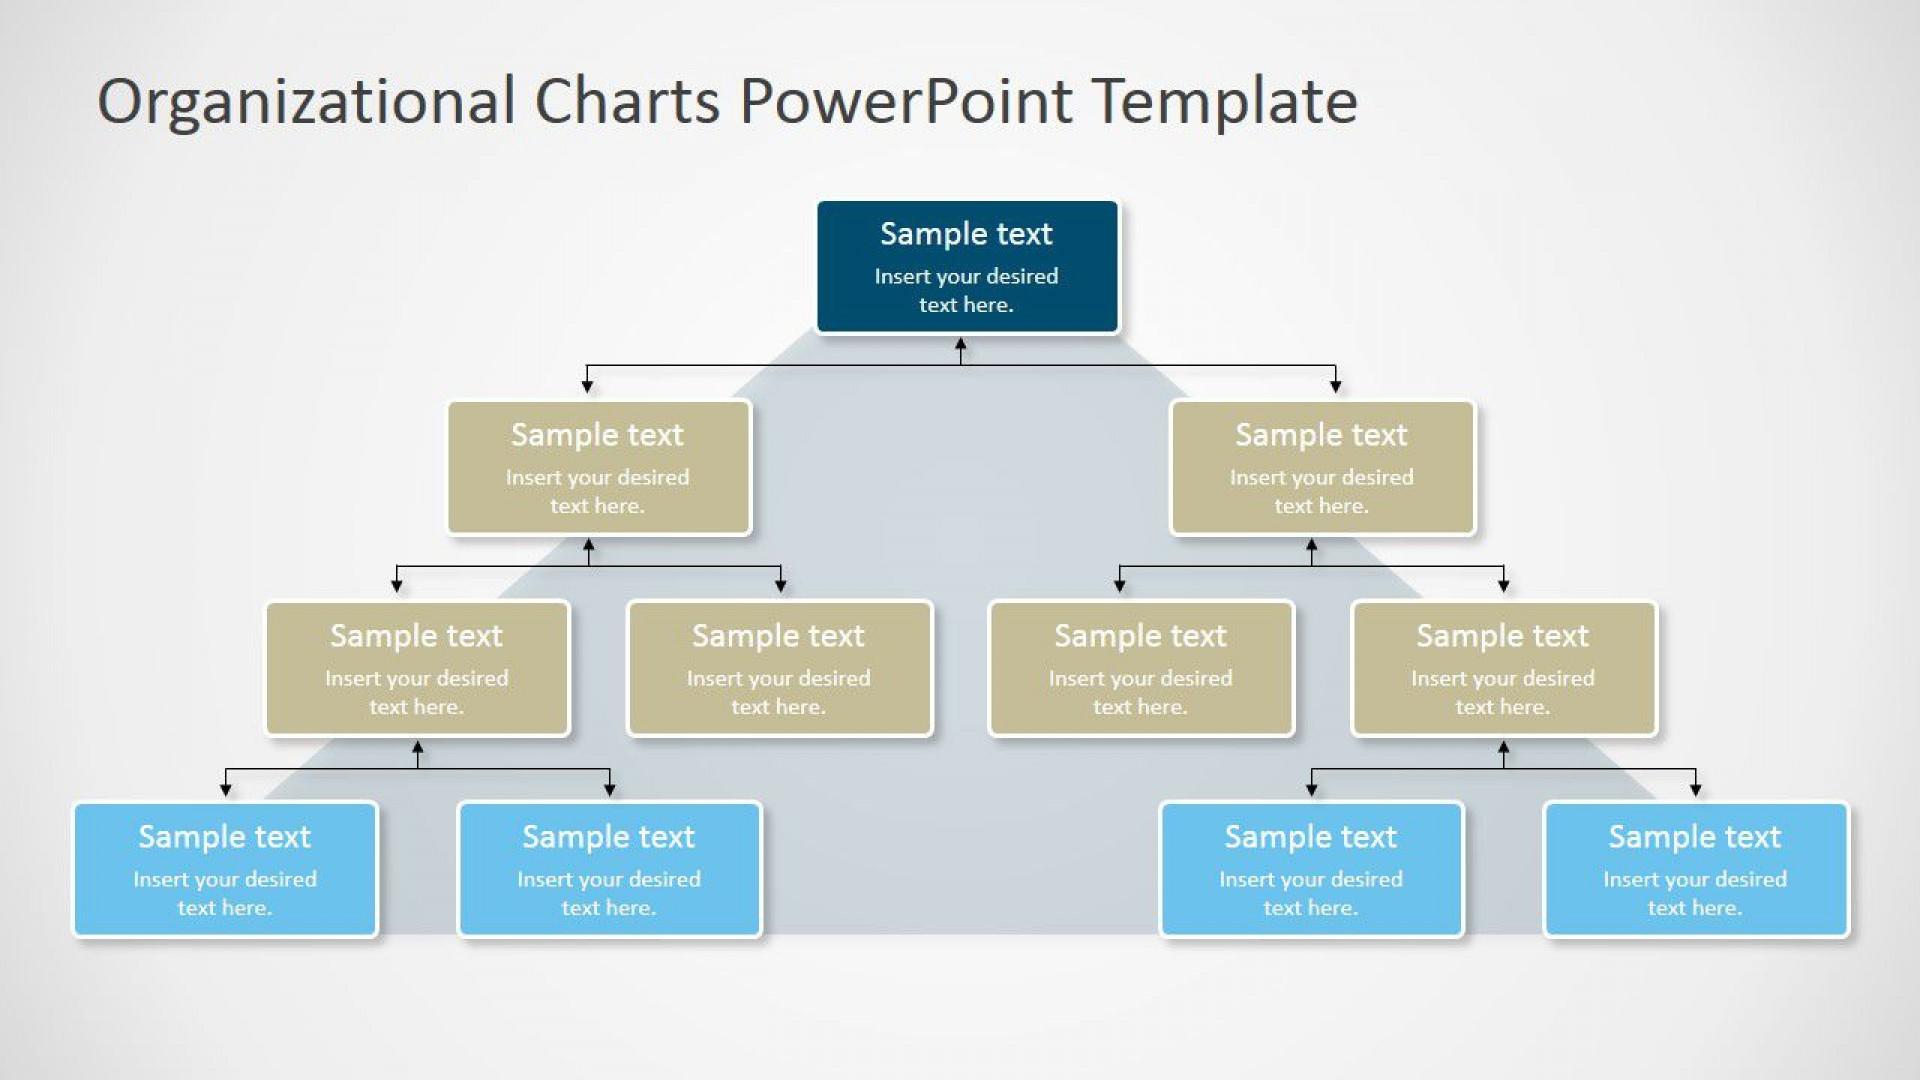 003 Breathtaking Org Chart Template Powerpoint High Resolution  Organization Free Download Organizational 2010 20131920